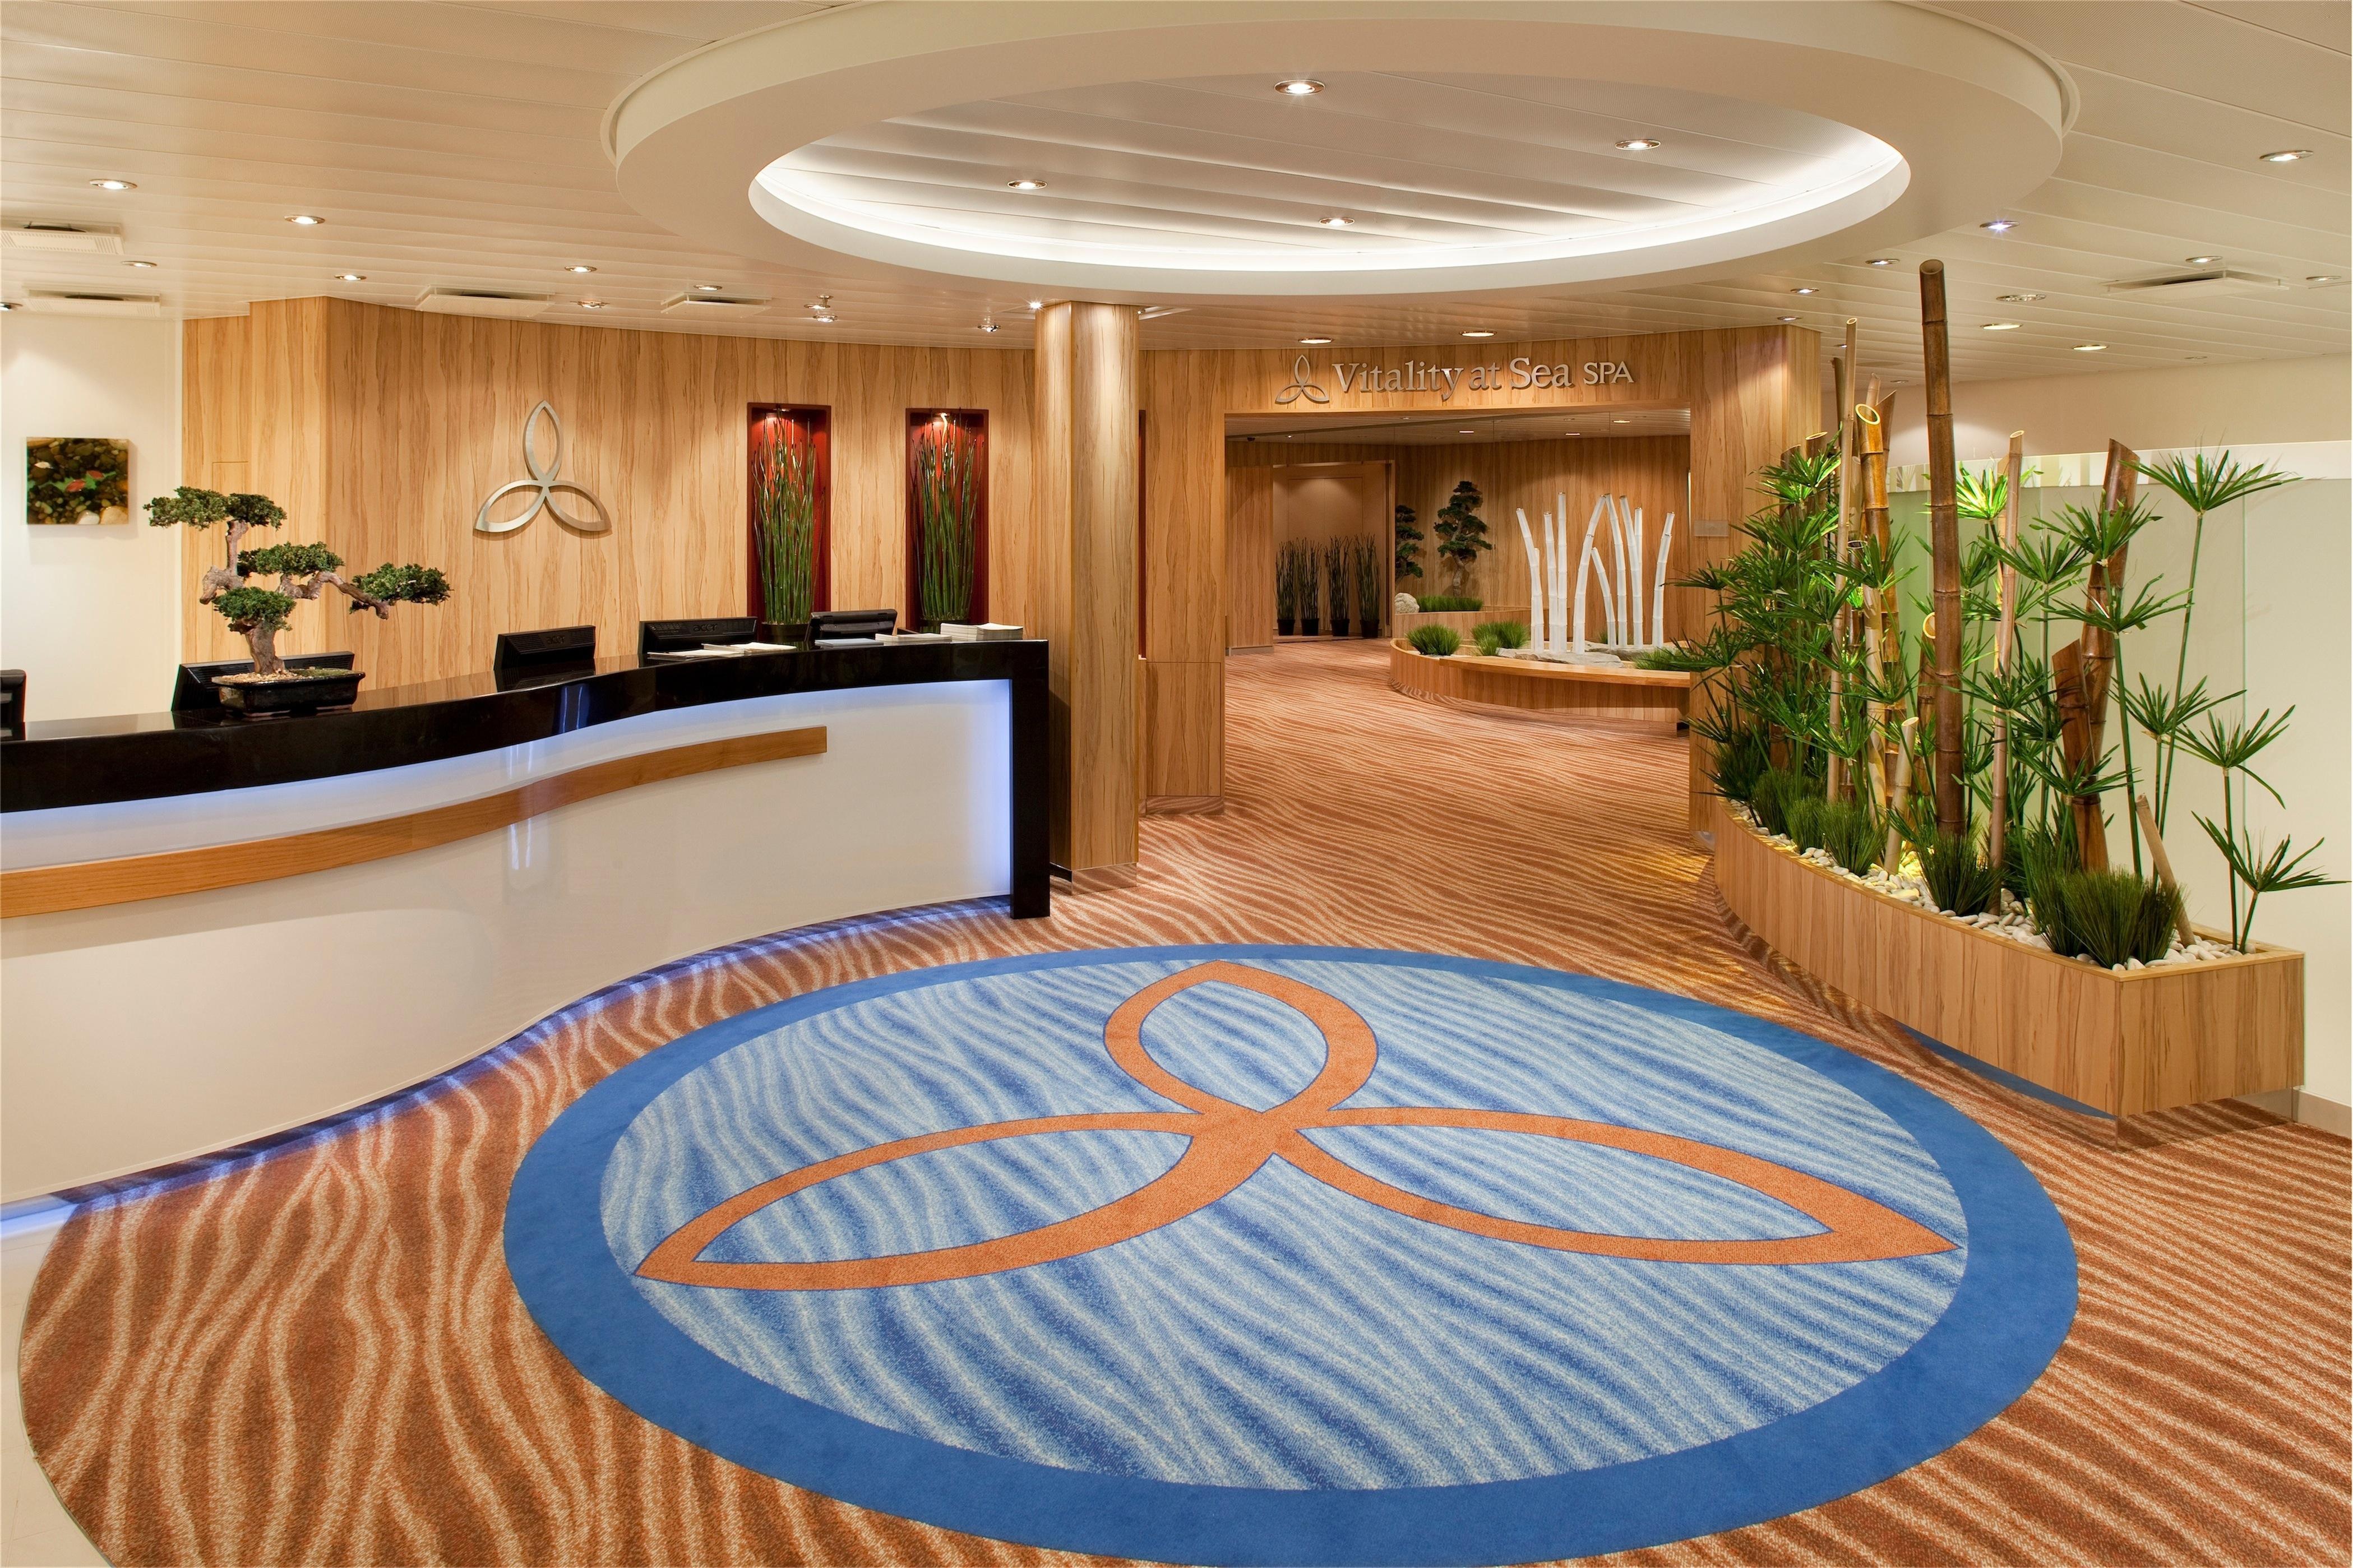 Royal Caribbean International Allure of the Seas Interior Spa Reception.jpg